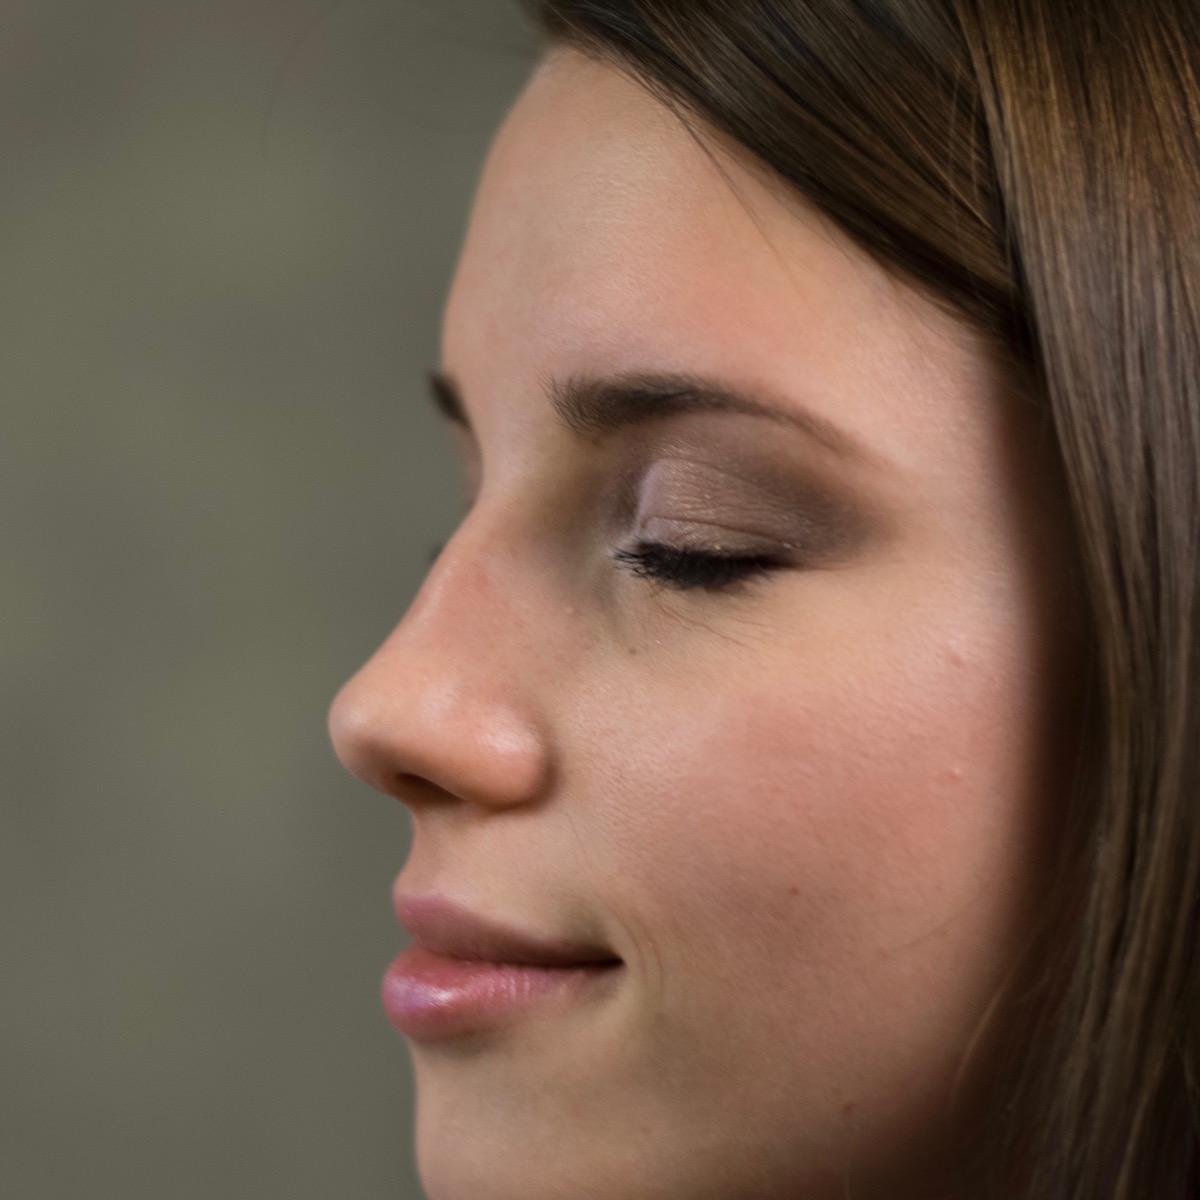 Avon mark kremno senčilo beautyfullblog ličenje makeup